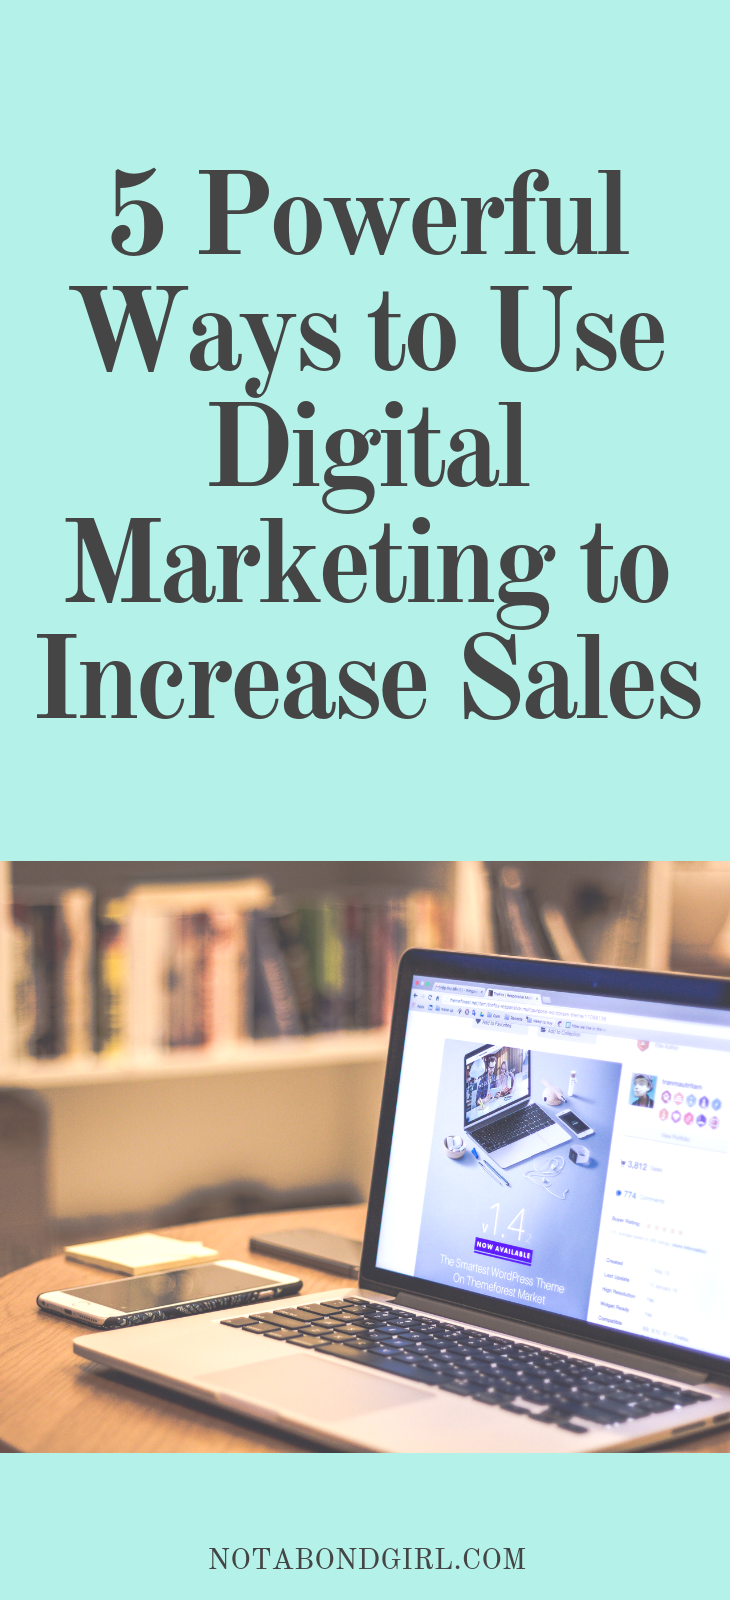 5 Powerful Ways to Use Digital Marketing to Increase Sales